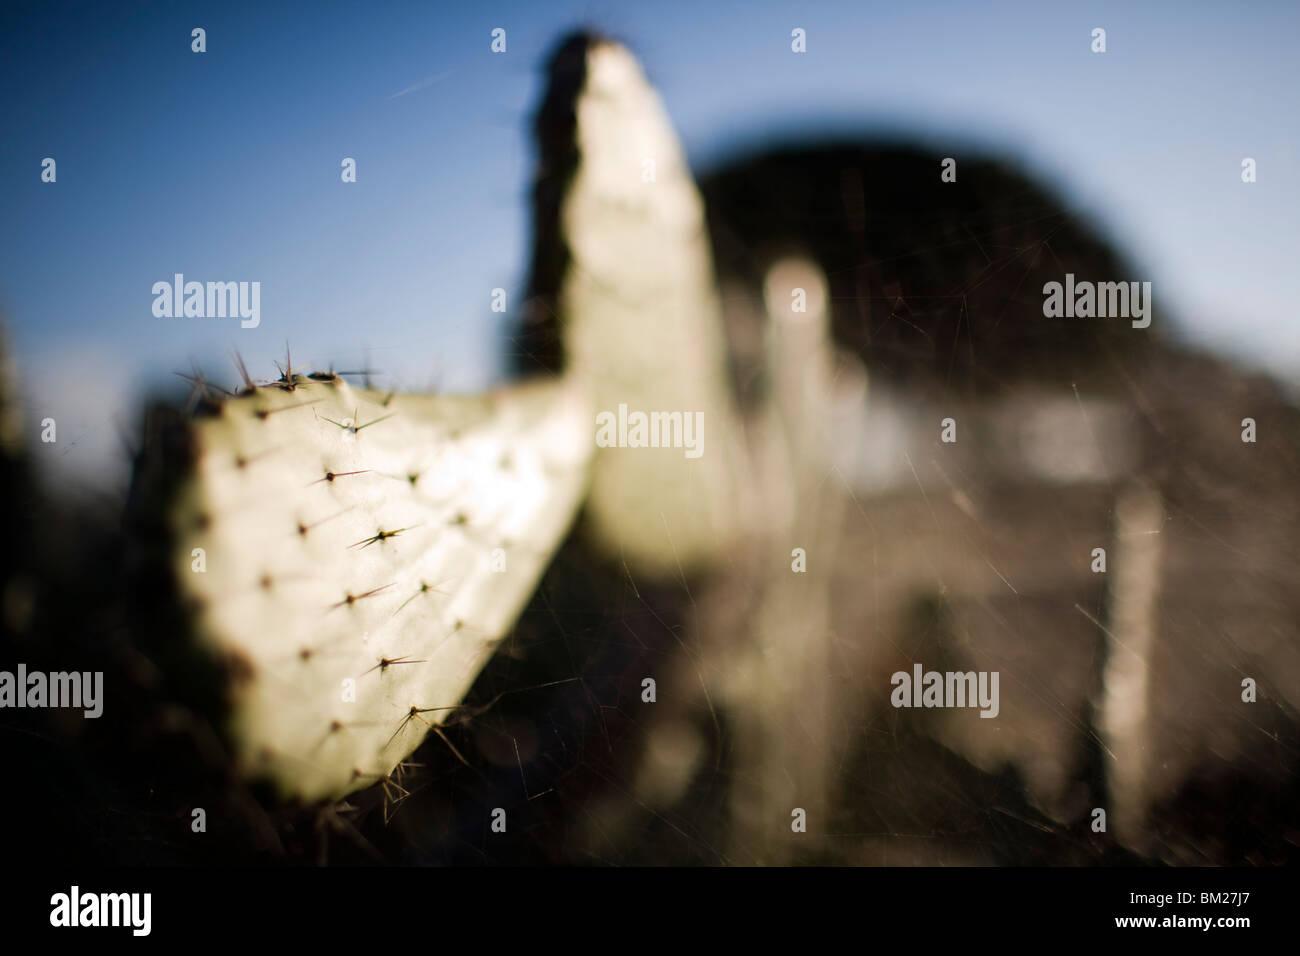 Cactus, Seville, Spain - Stock Image